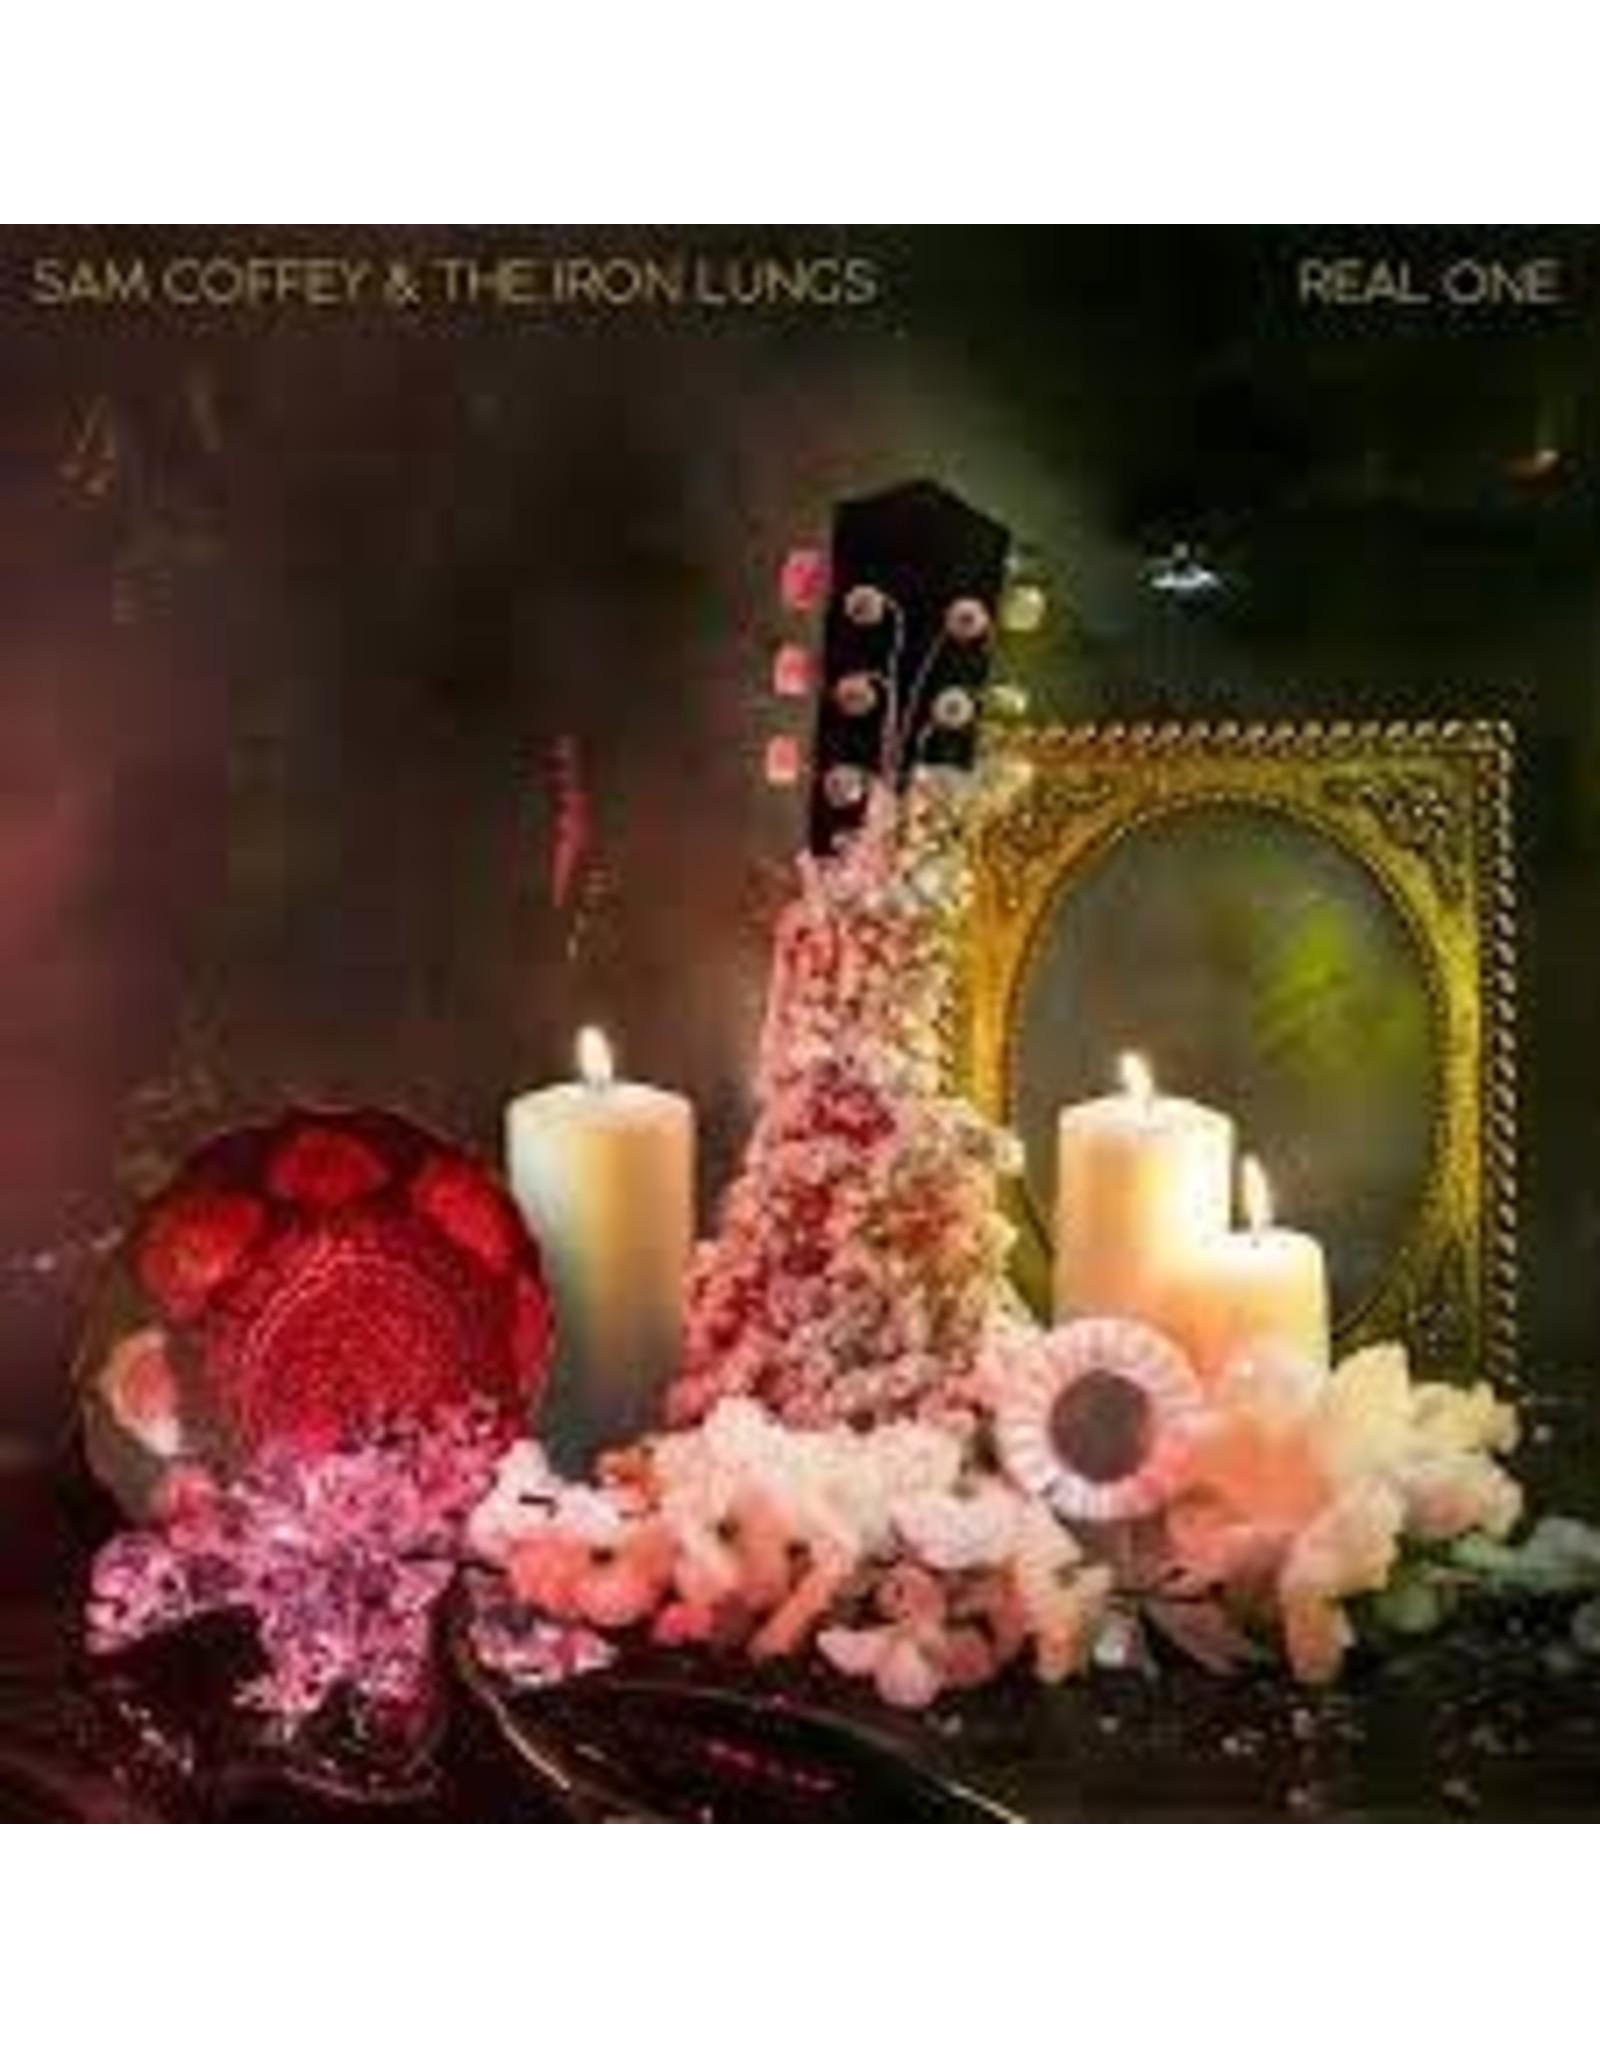 Coffey, Sam - Real One LP